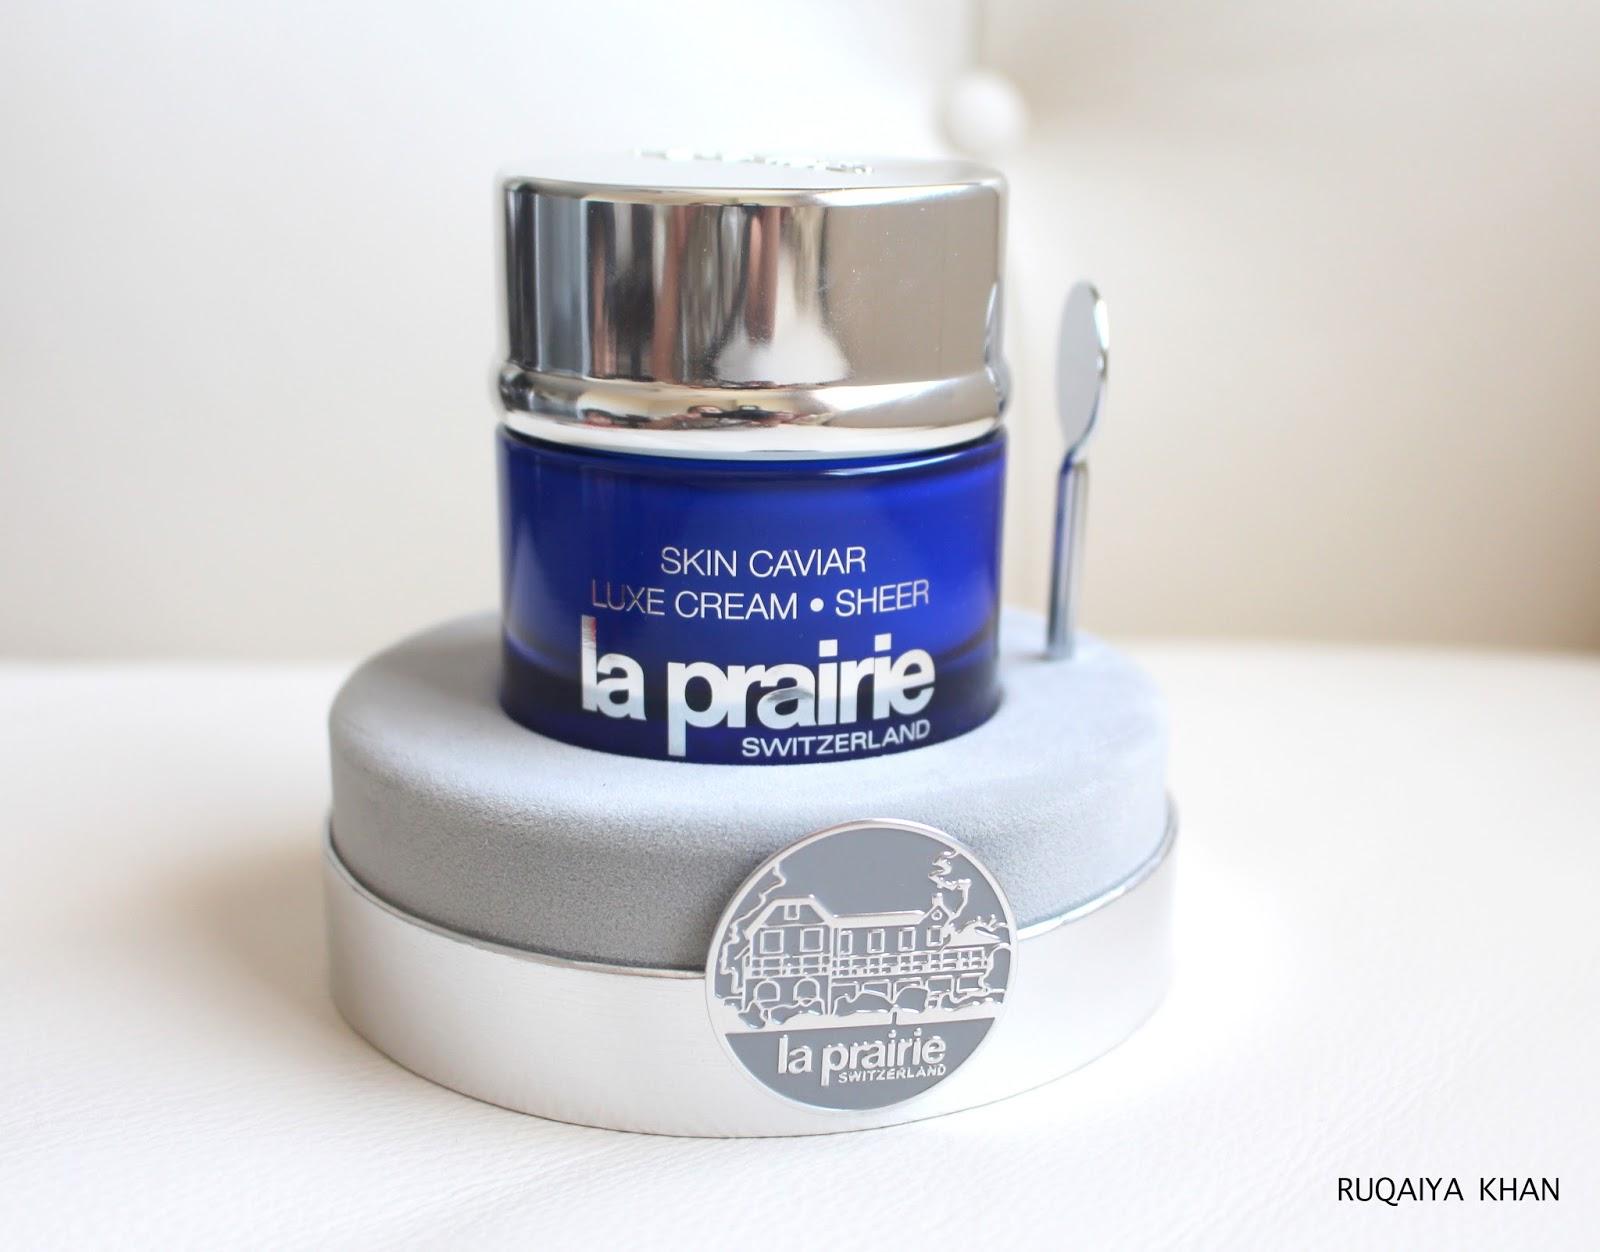 ruqaiya khan la prairie skin caviar luxe cream sheer review. Black Bedroom Furniture Sets. Home Design Ideas